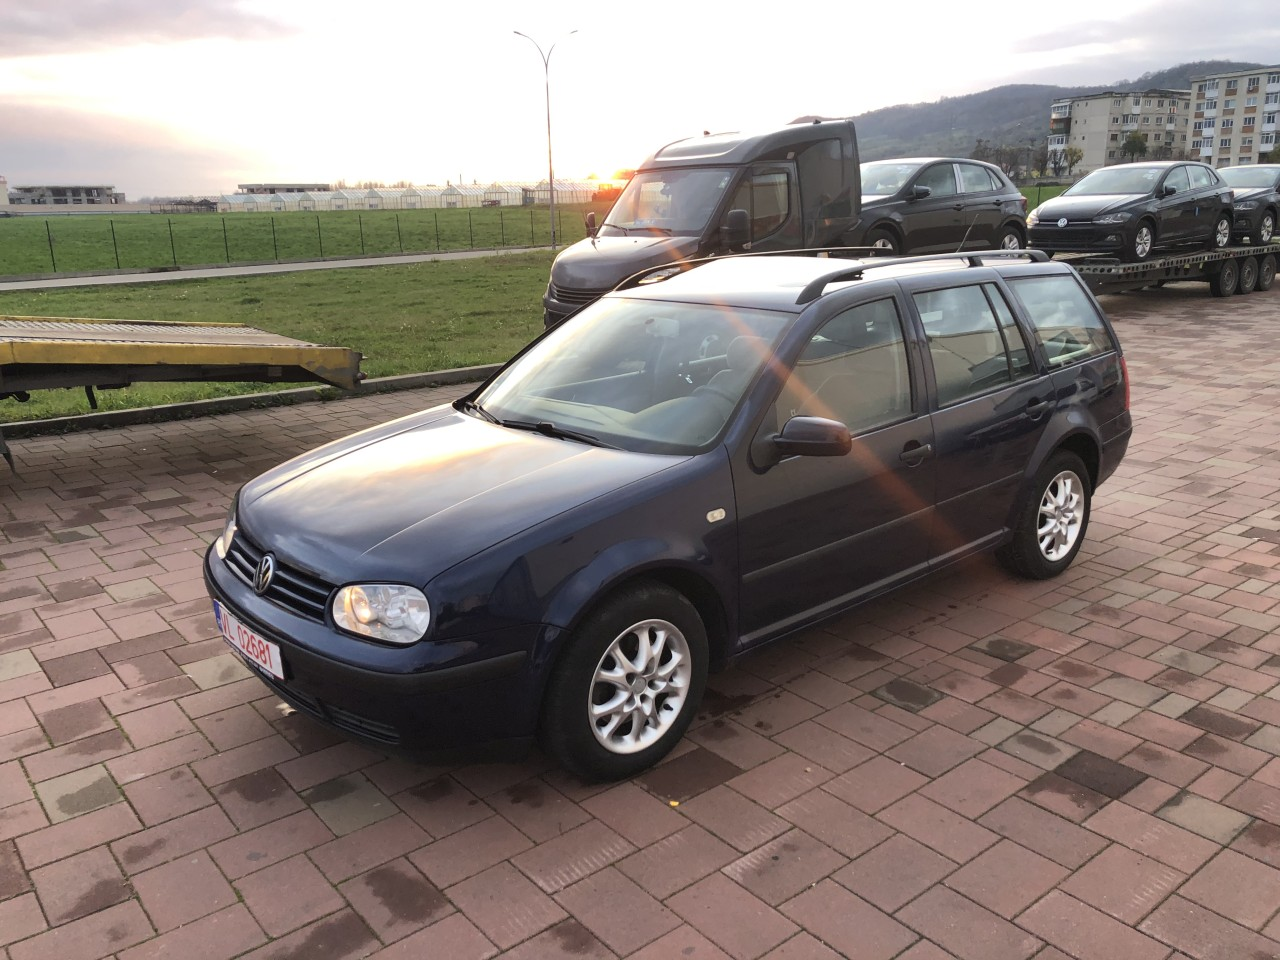 VW Golf 1.4i - 16V 1999